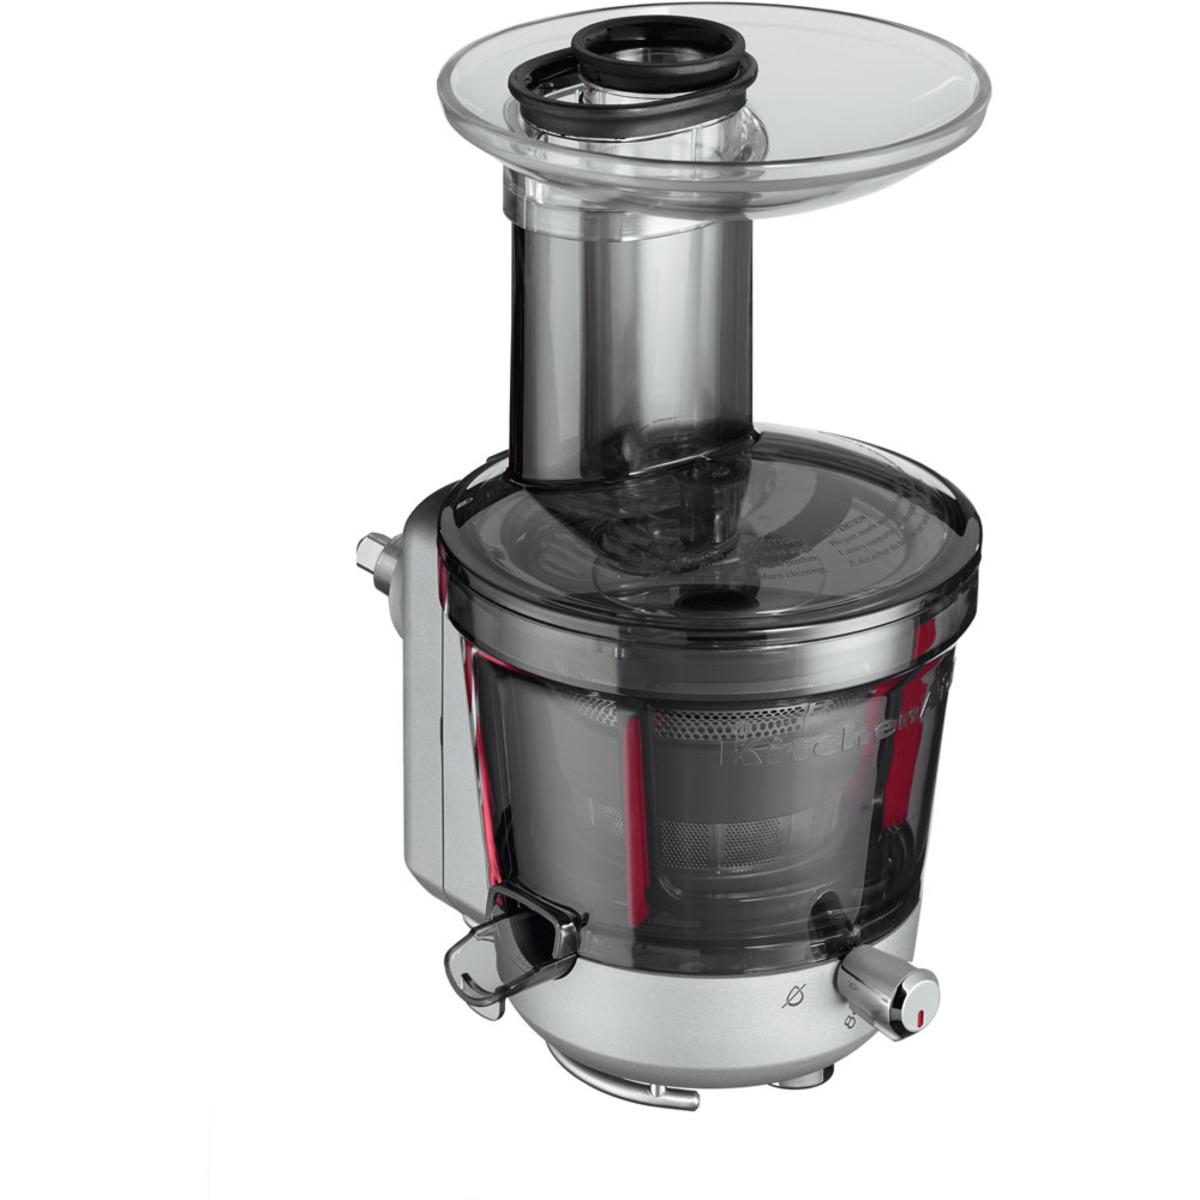 KitchenAid 5KSM1JA Maximum Extraction Slow Juicer & Sauce Attachment